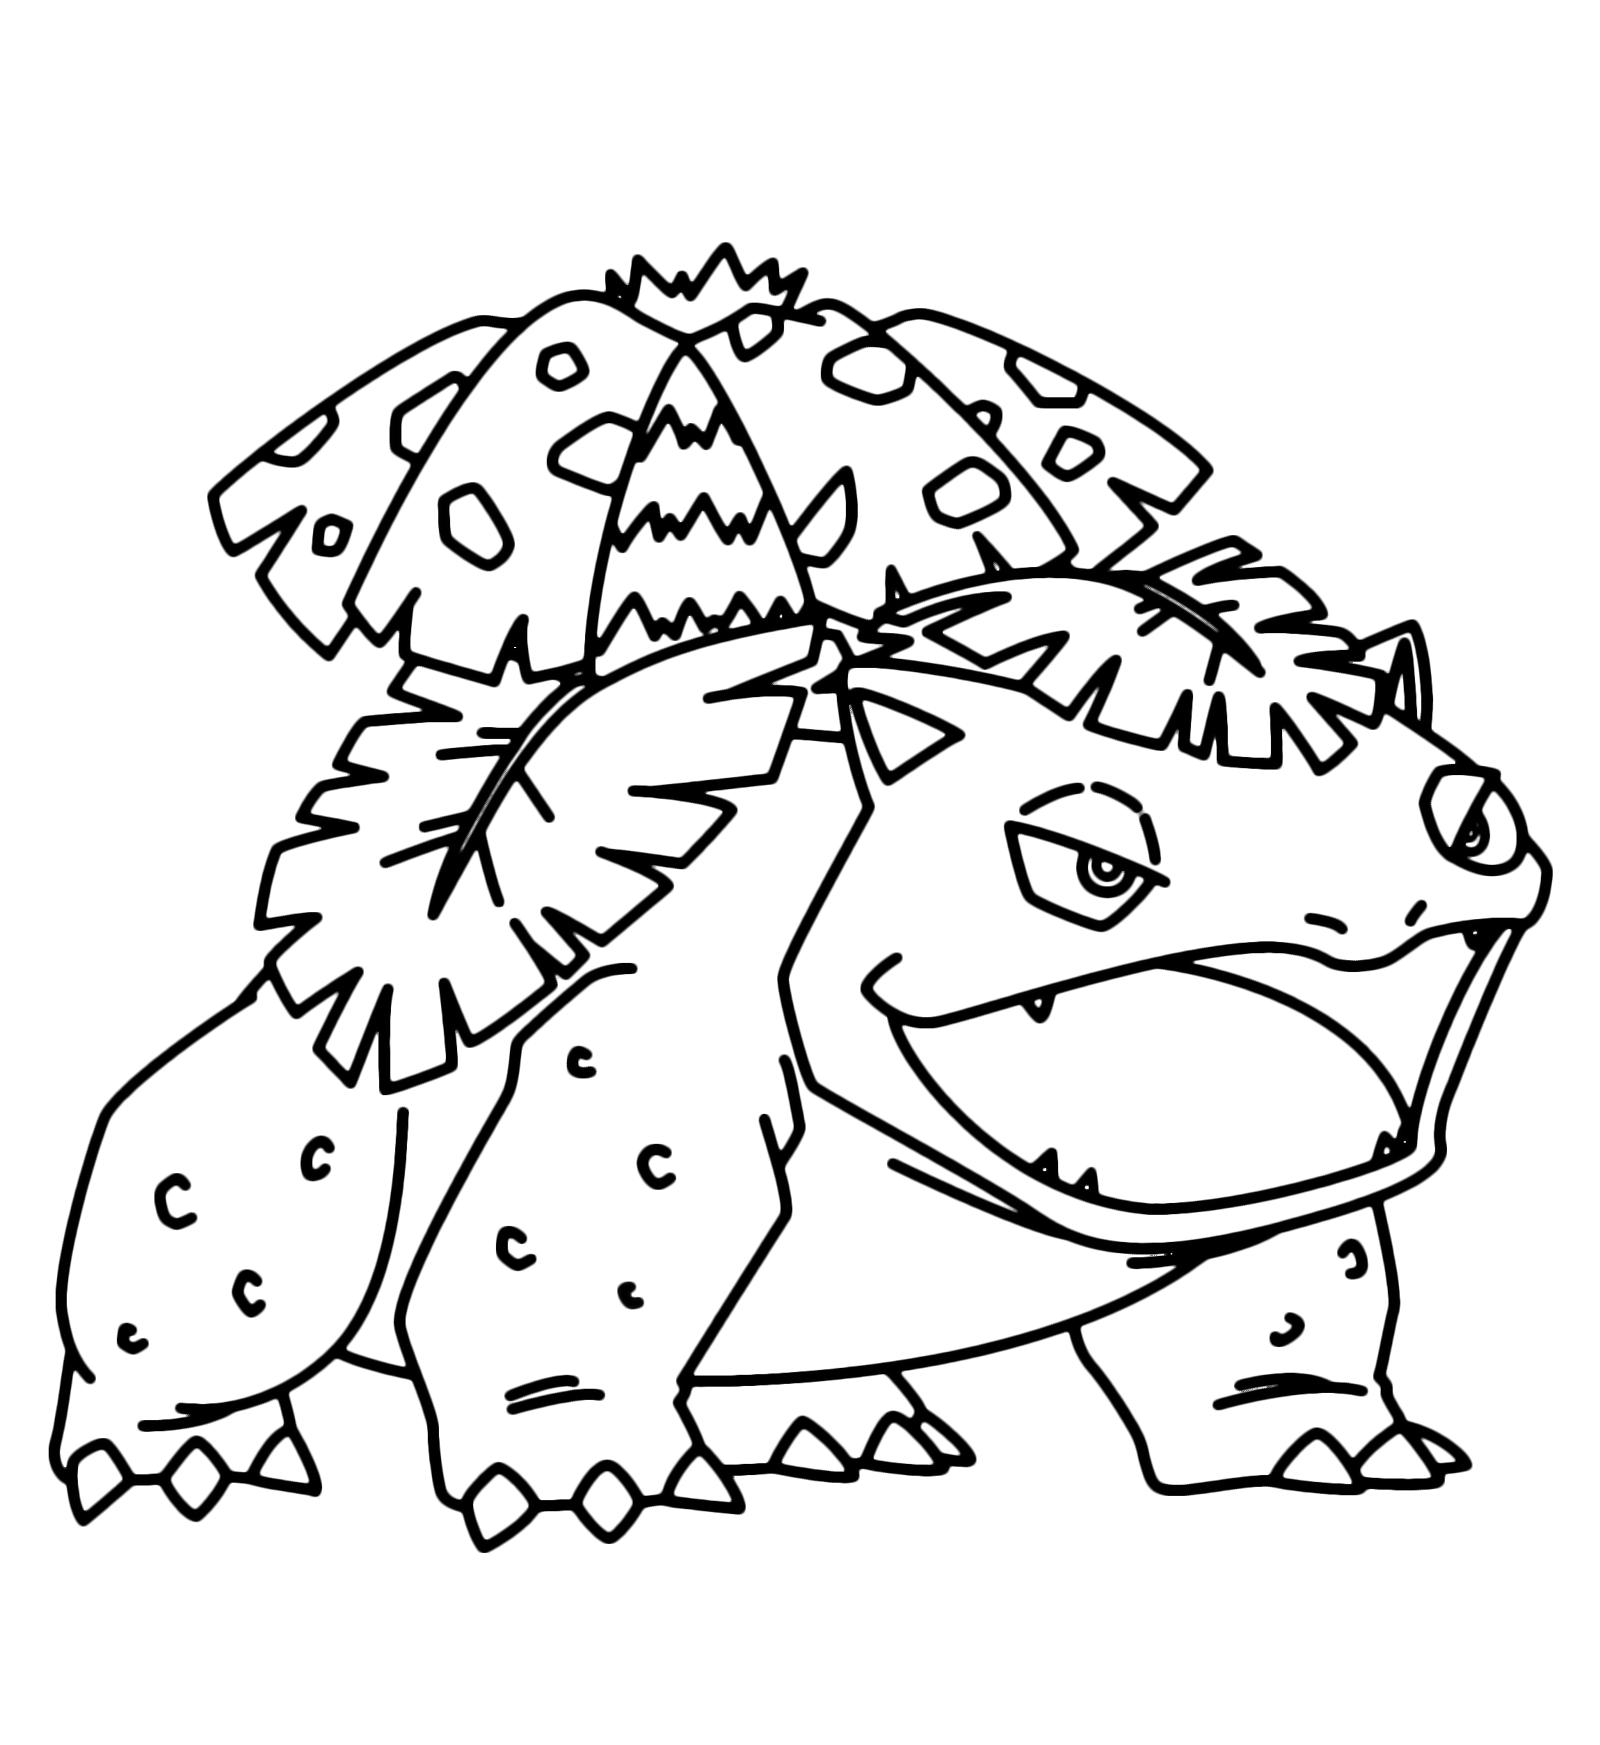 Pokémon - Gen. 1 - Il pericoloso Venusaur - 3 - Erba